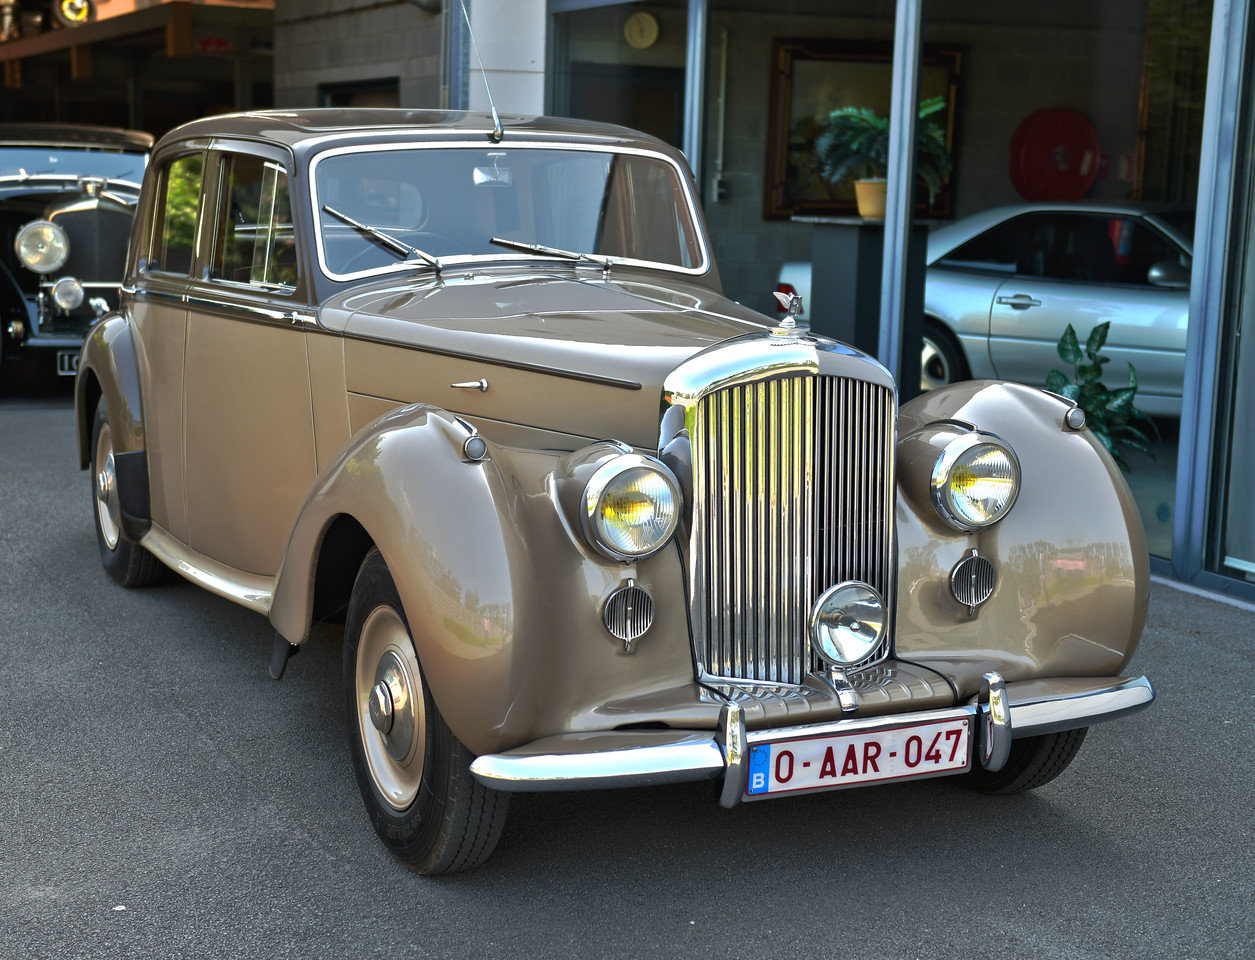 1949 Bentley Mark 6 Standard Steel Saloon For Sale (picture 1 of 6)